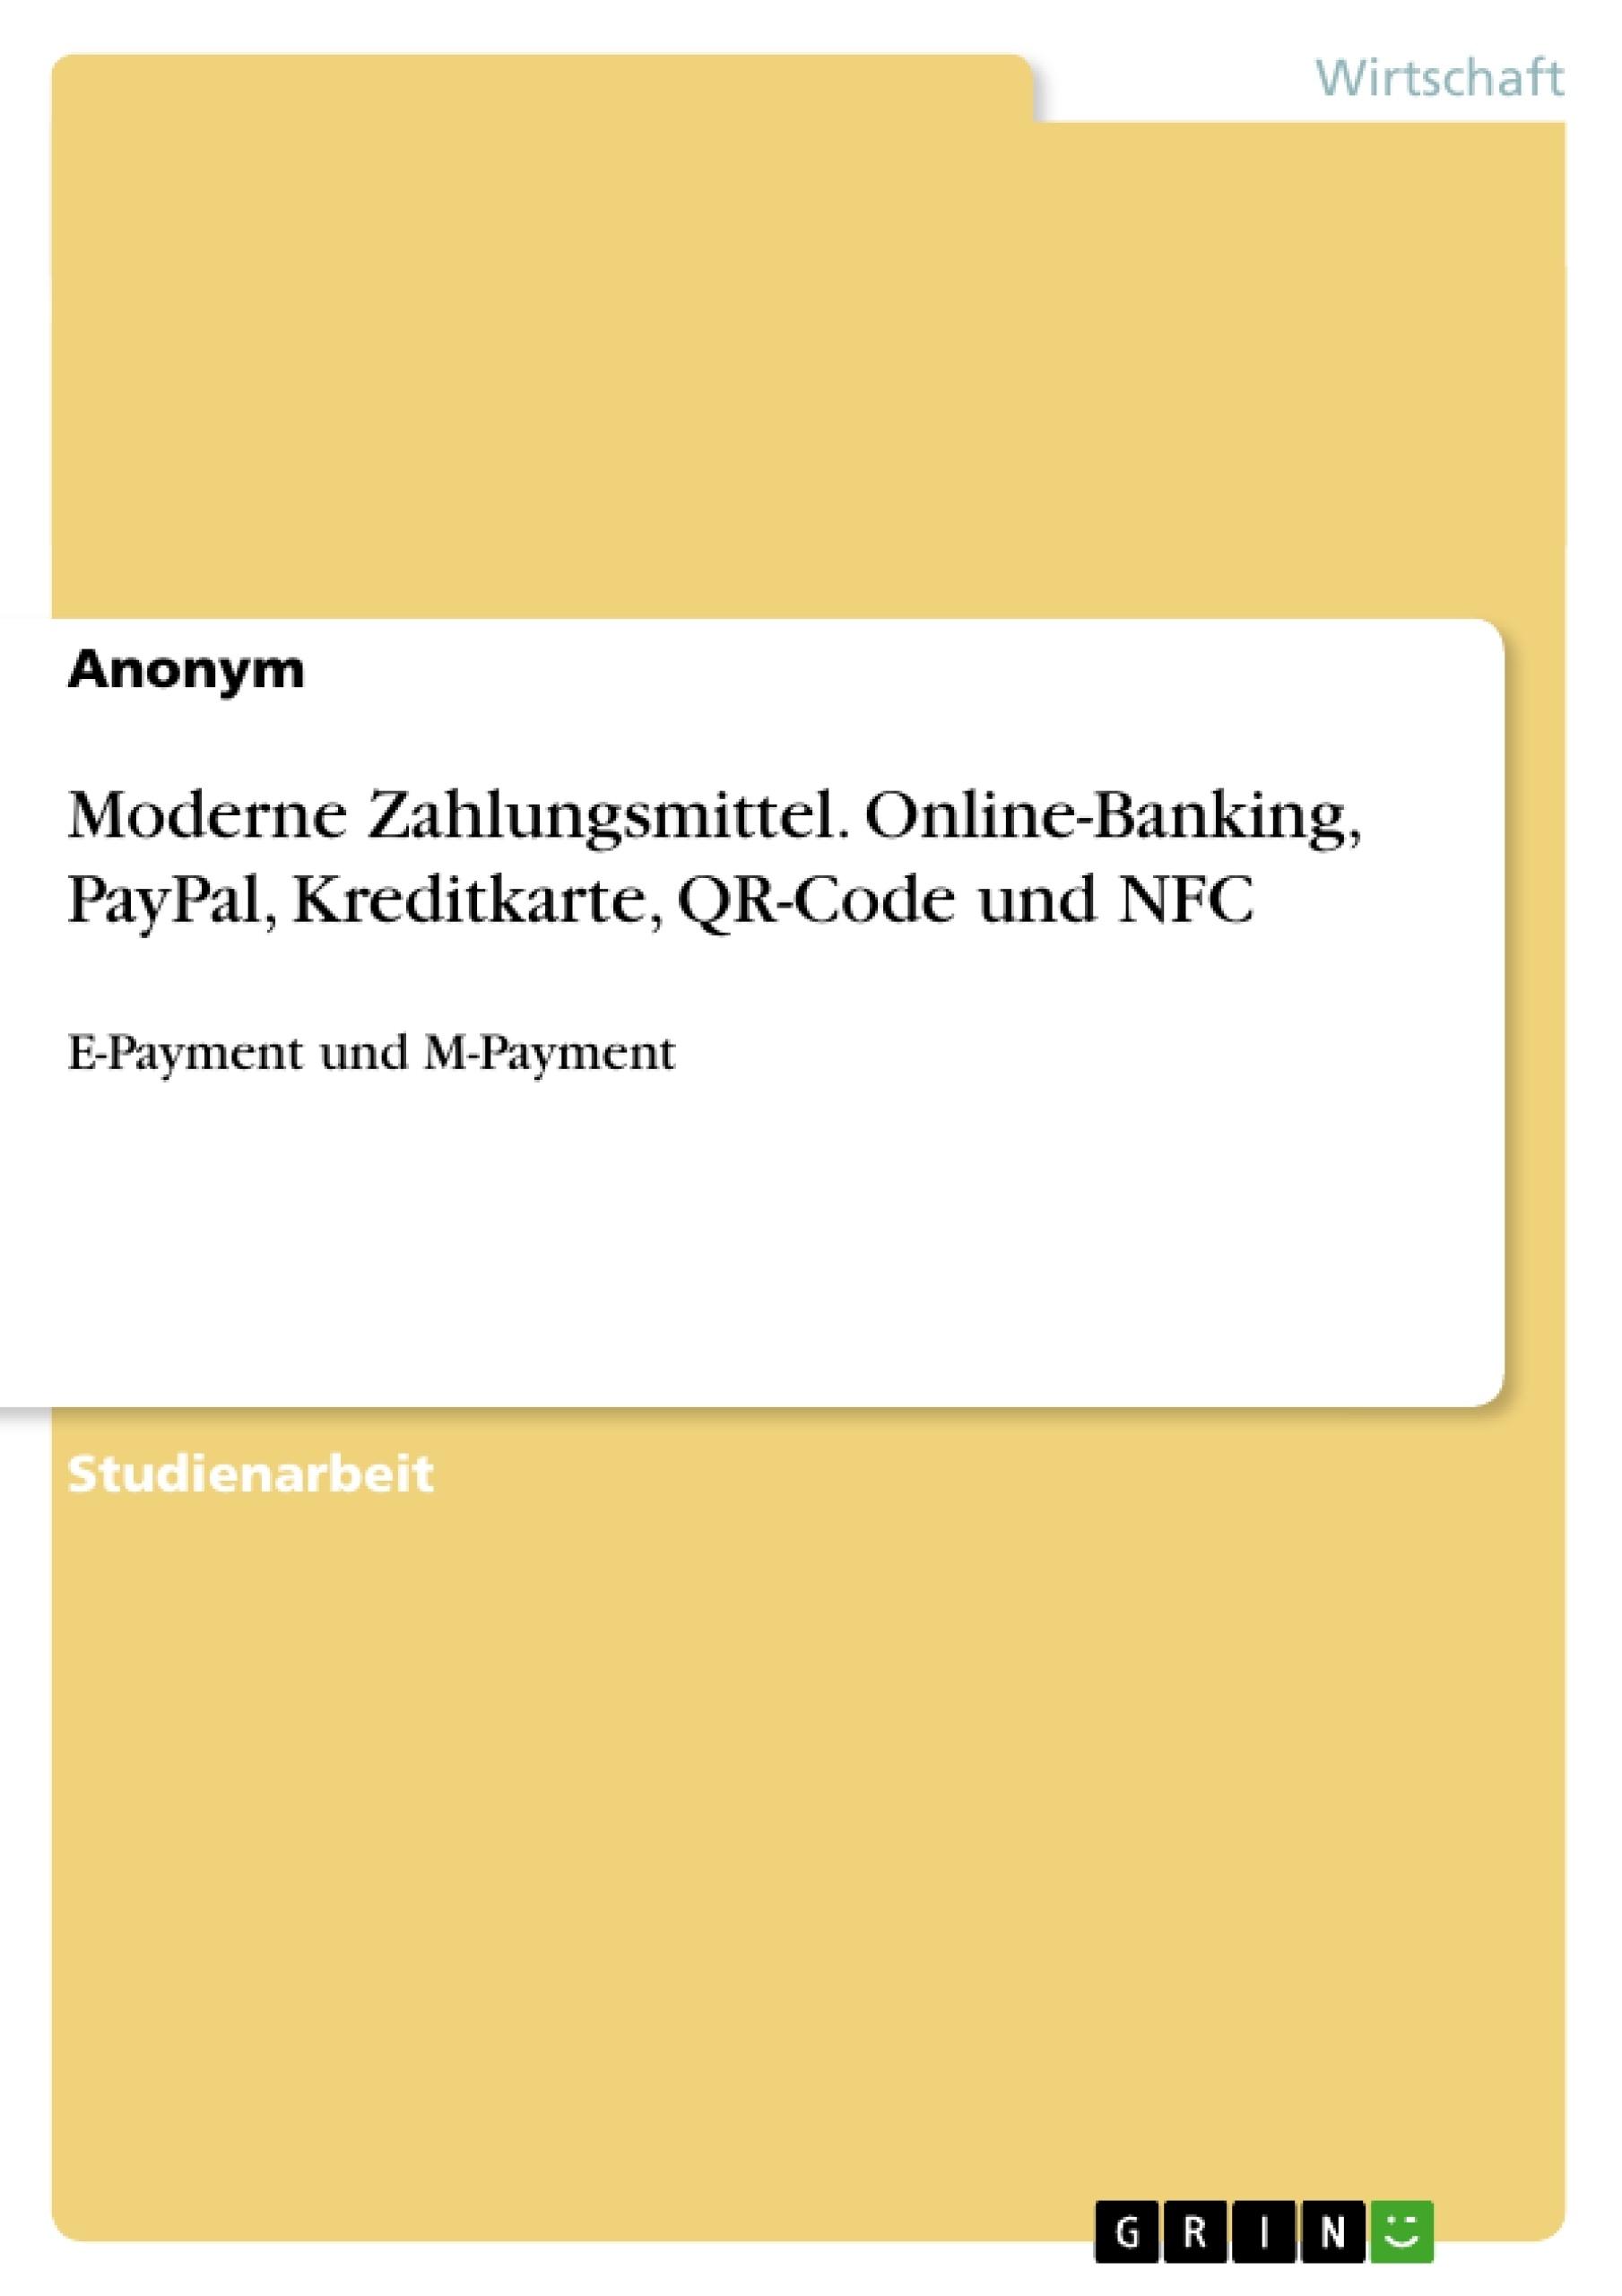 Moderne Zahlungsmittel. Online-Banking, PayPal, Kreditkarte ...